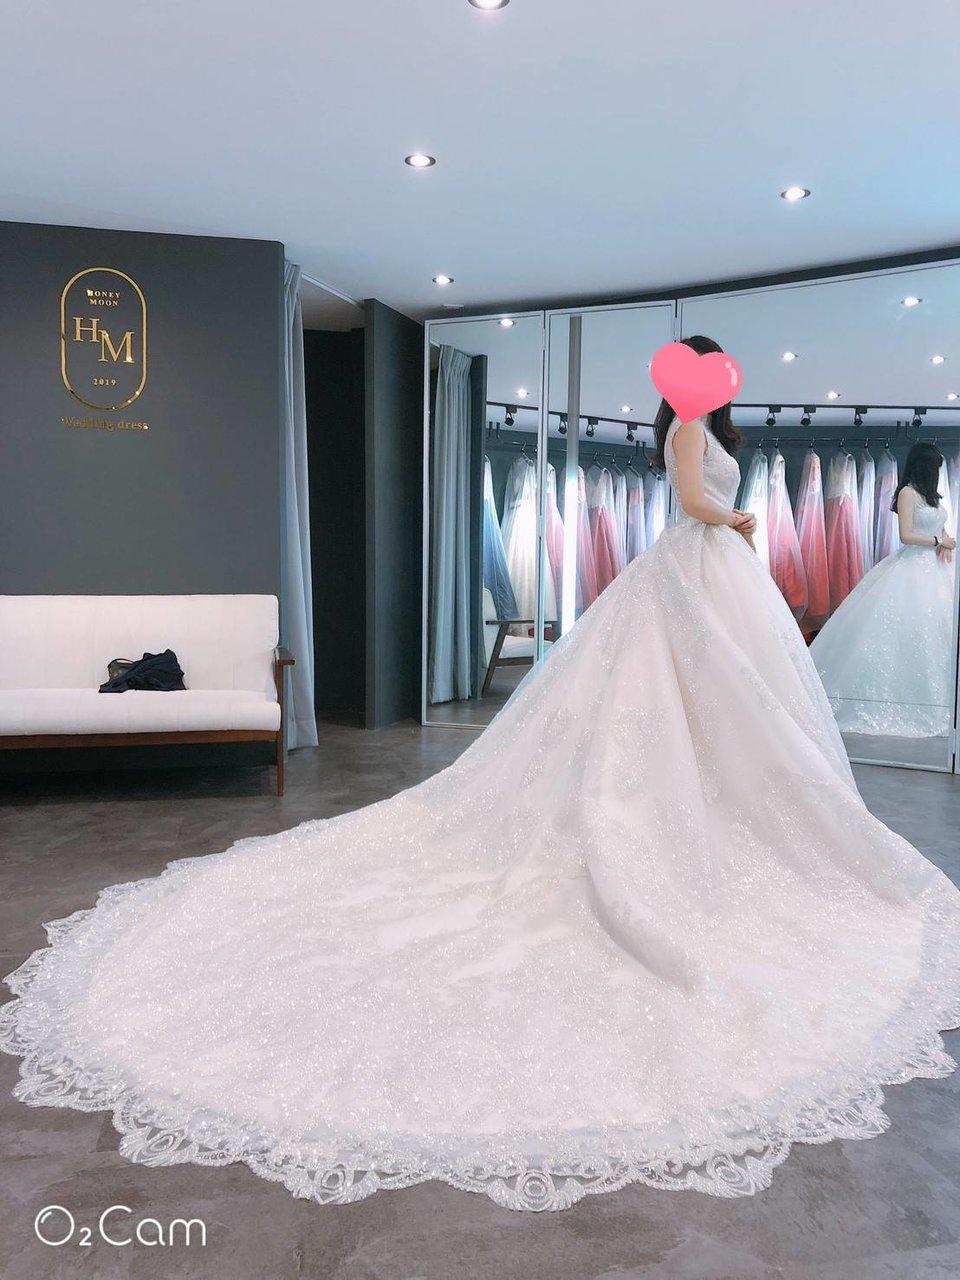 J2 wedding 中壢 手工訂製婚紗,真心推薦【J2 Wedding中壢店】值得最特別的你擁有它~是個有溫度的婚紗工作室~